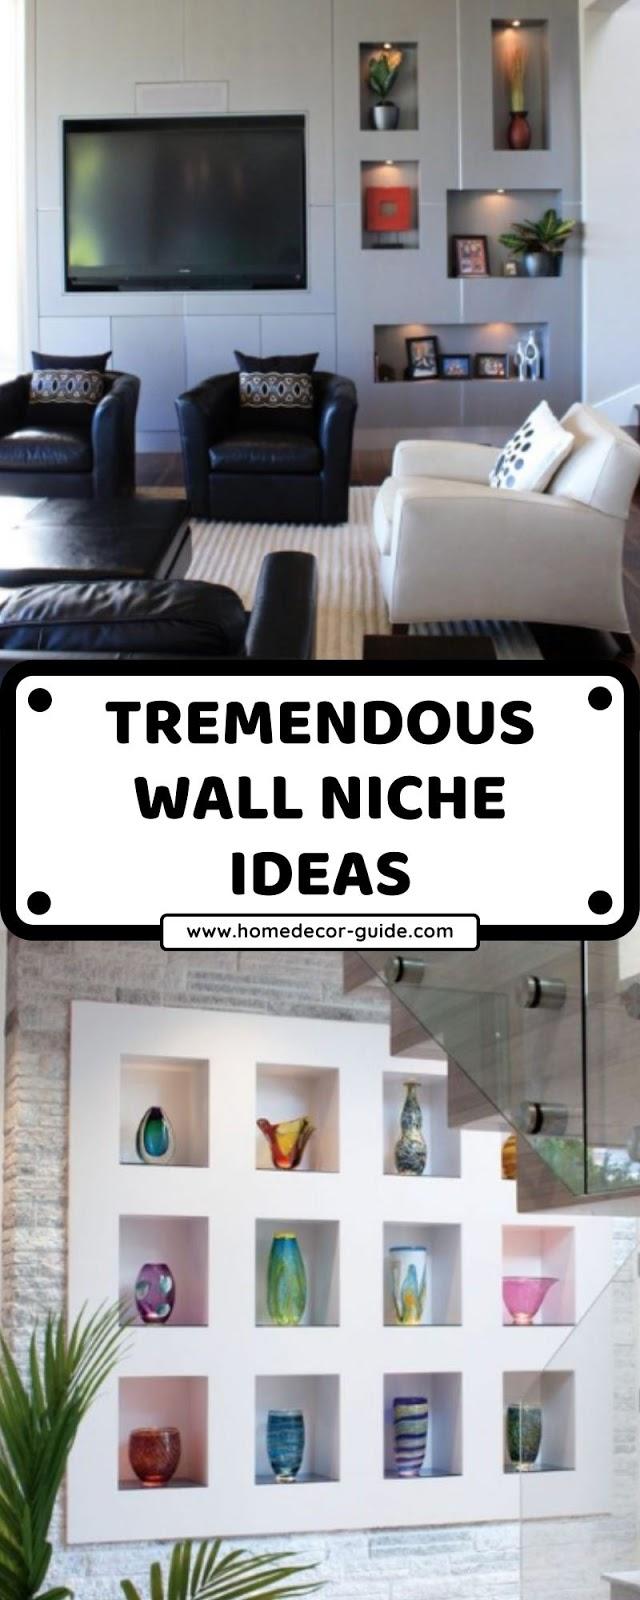 TREMENDOUS WALL NICHE IDEAS